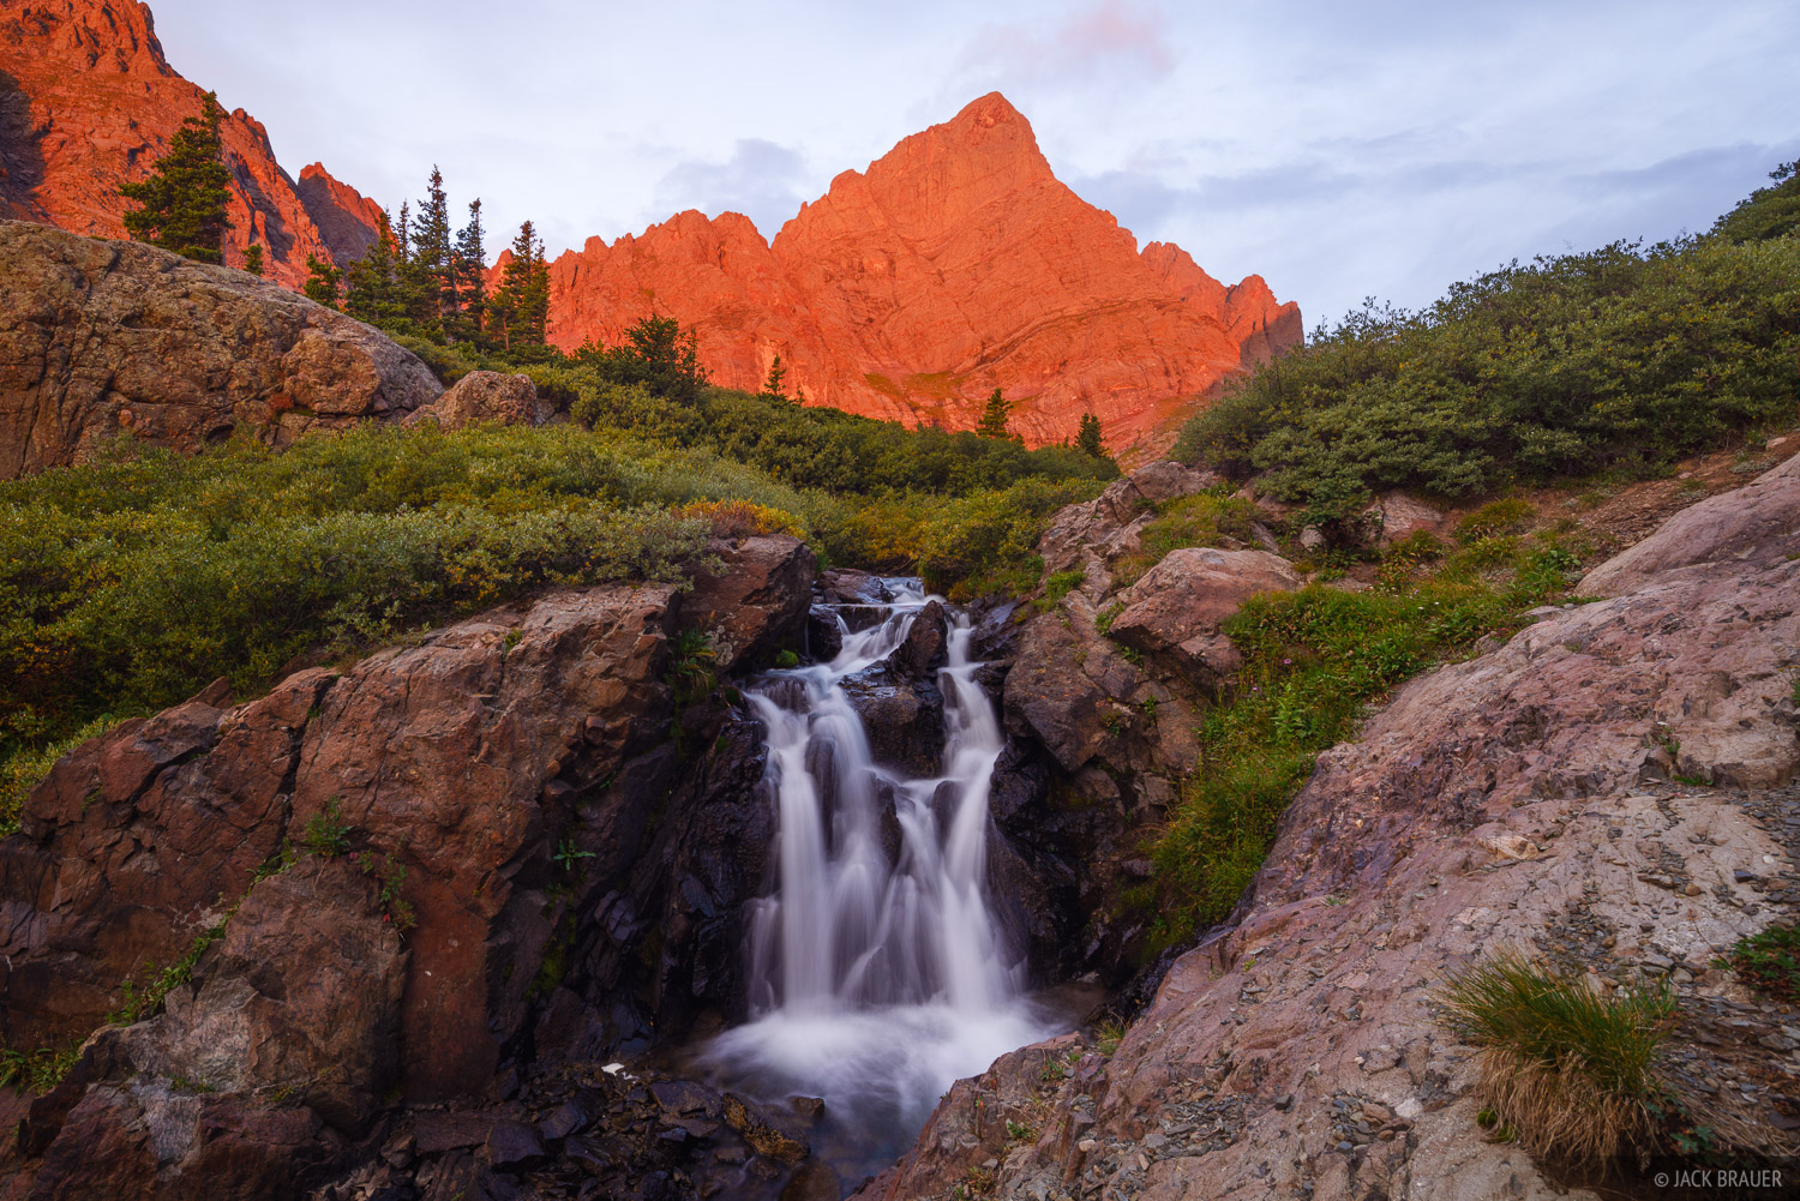 Colorado, Crestone Needle, Sangre de Cristos, waterfall, 14er, sunrise, Sangre de Cristo Wilderness, photo